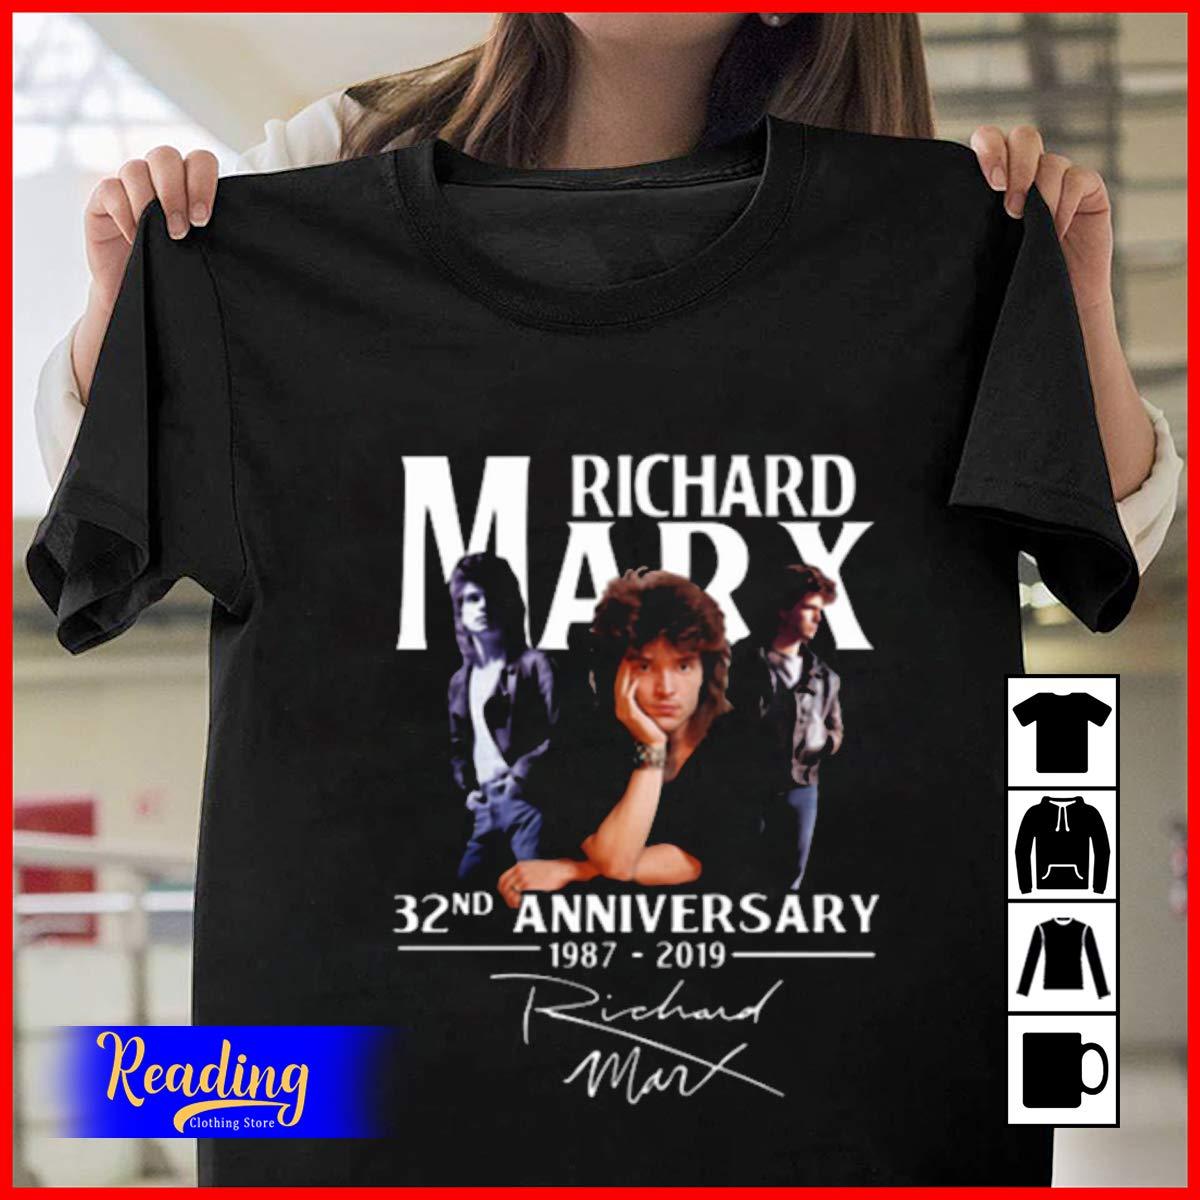 Richard-marx 32nd Anniversary 1987-2019 Signature T-shirt, , , Tank Top